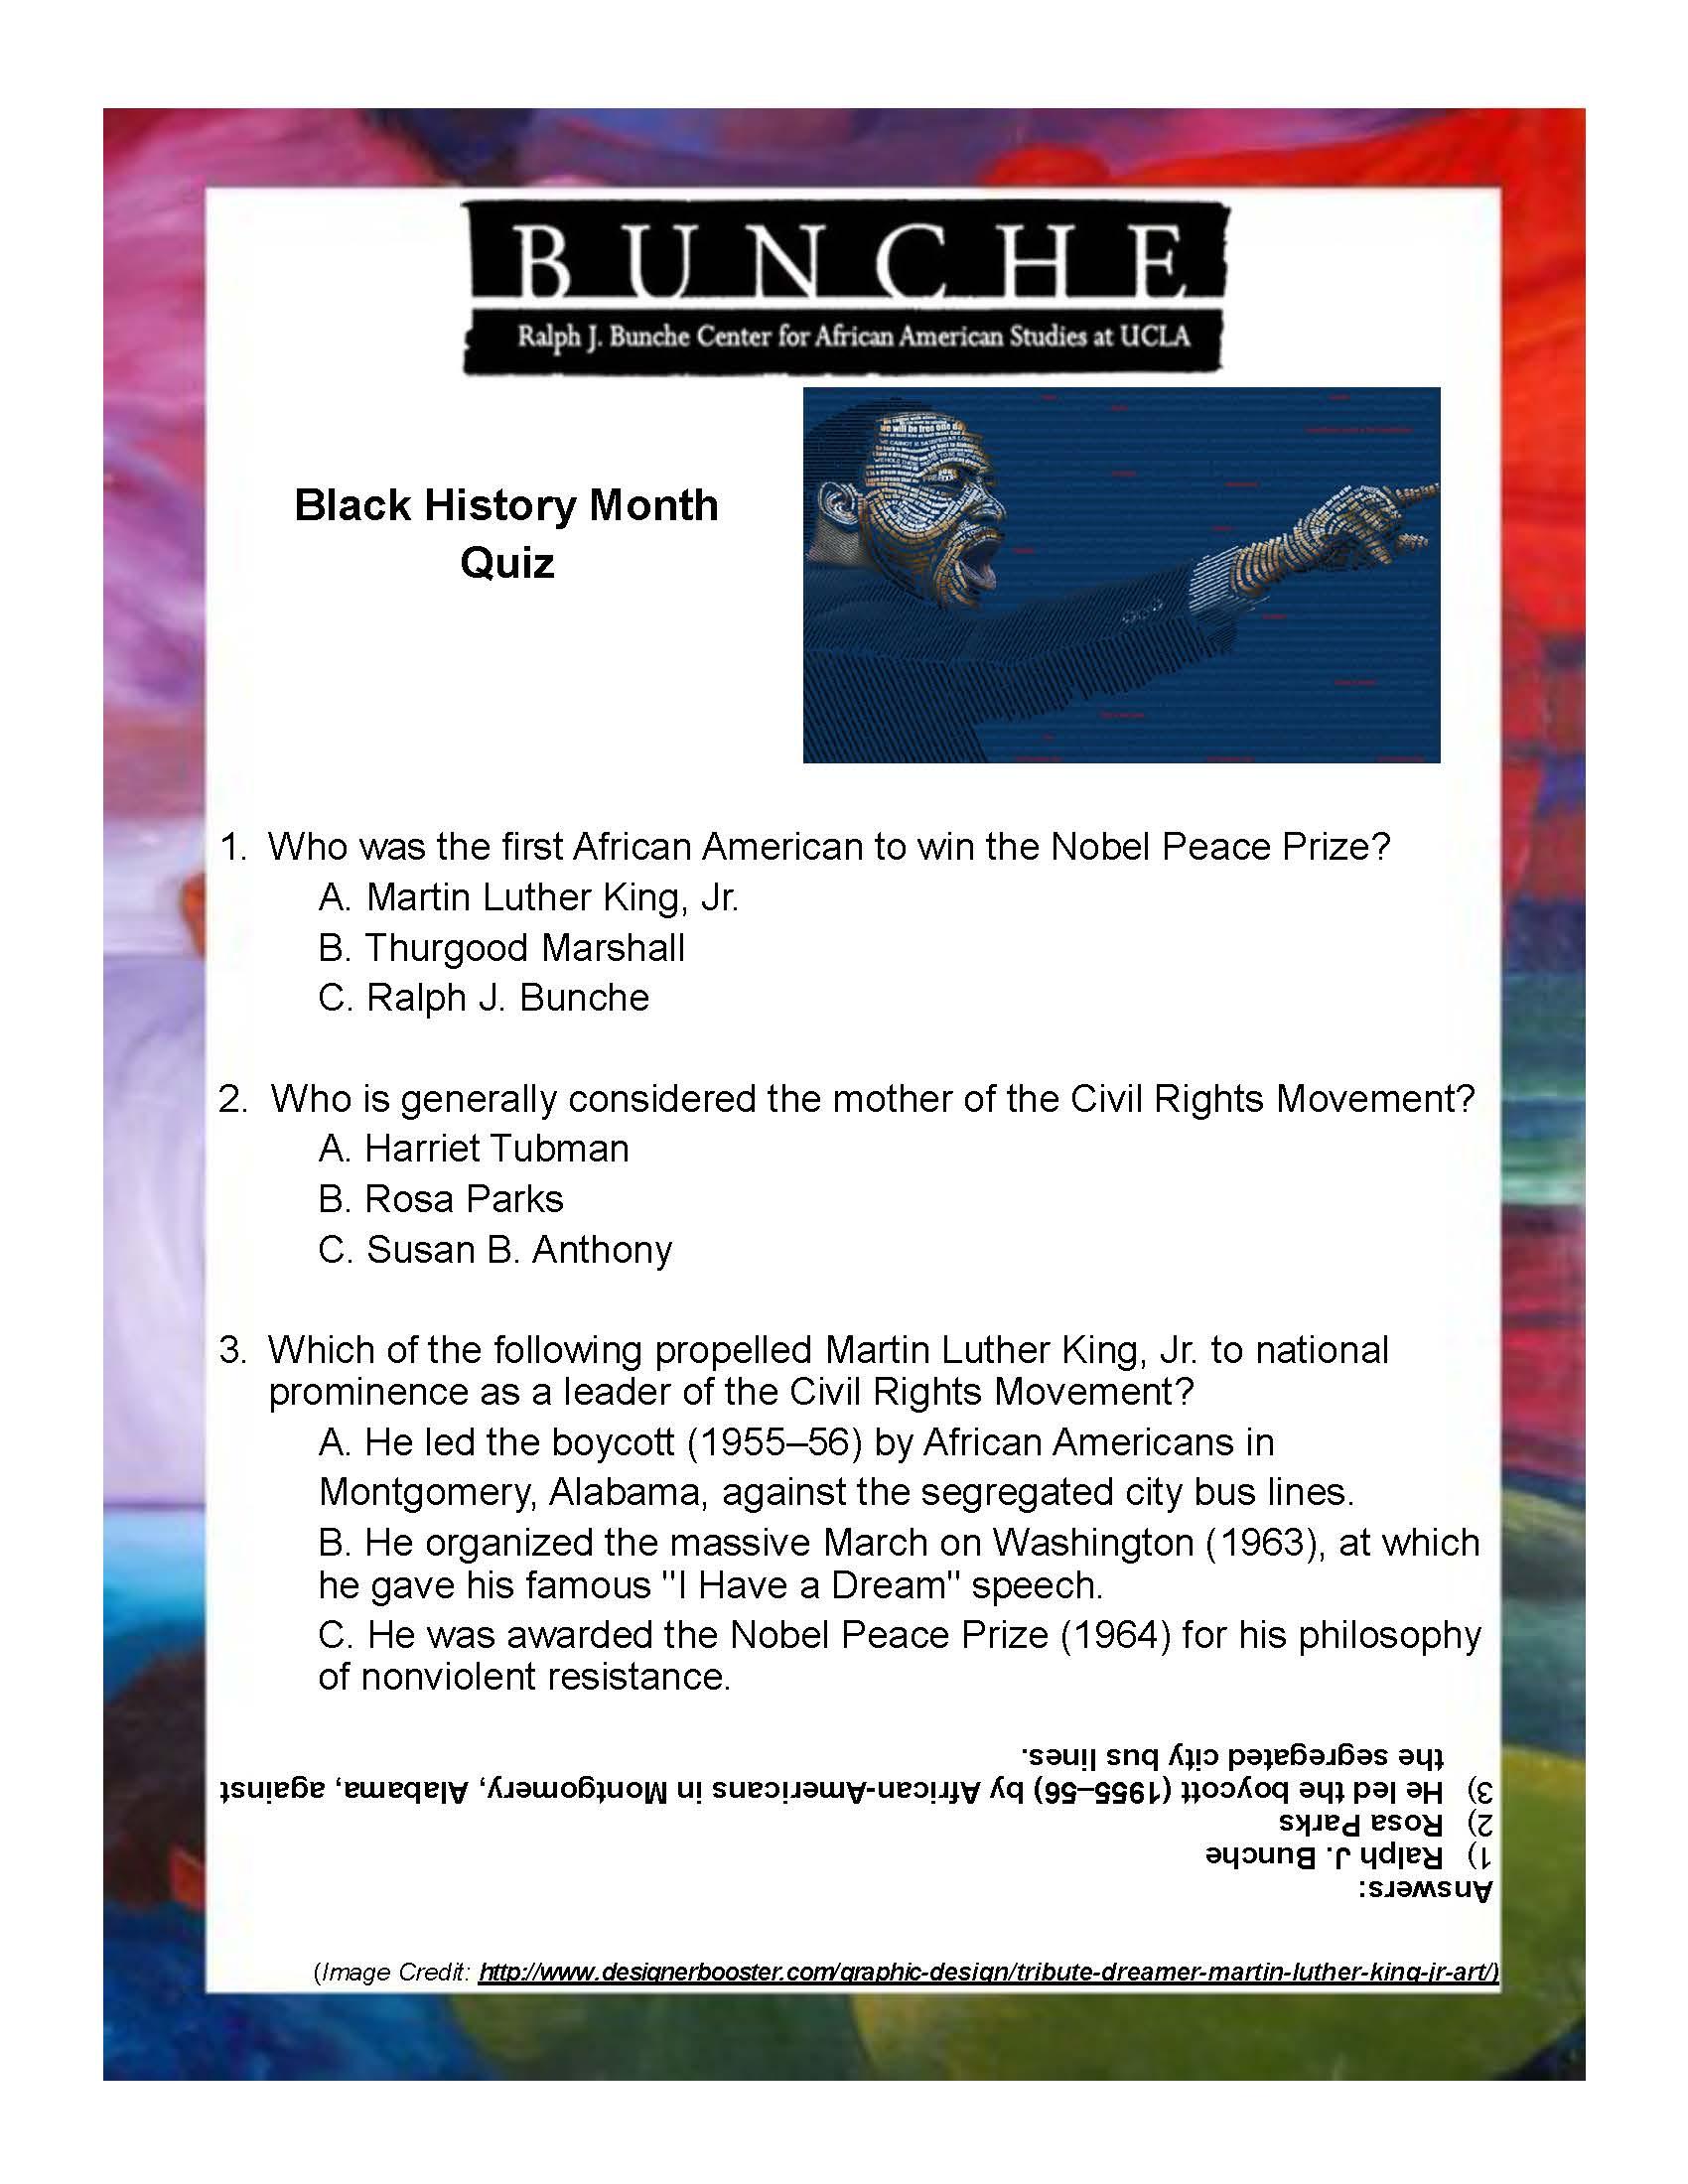 Black History Month 2016 Quiz